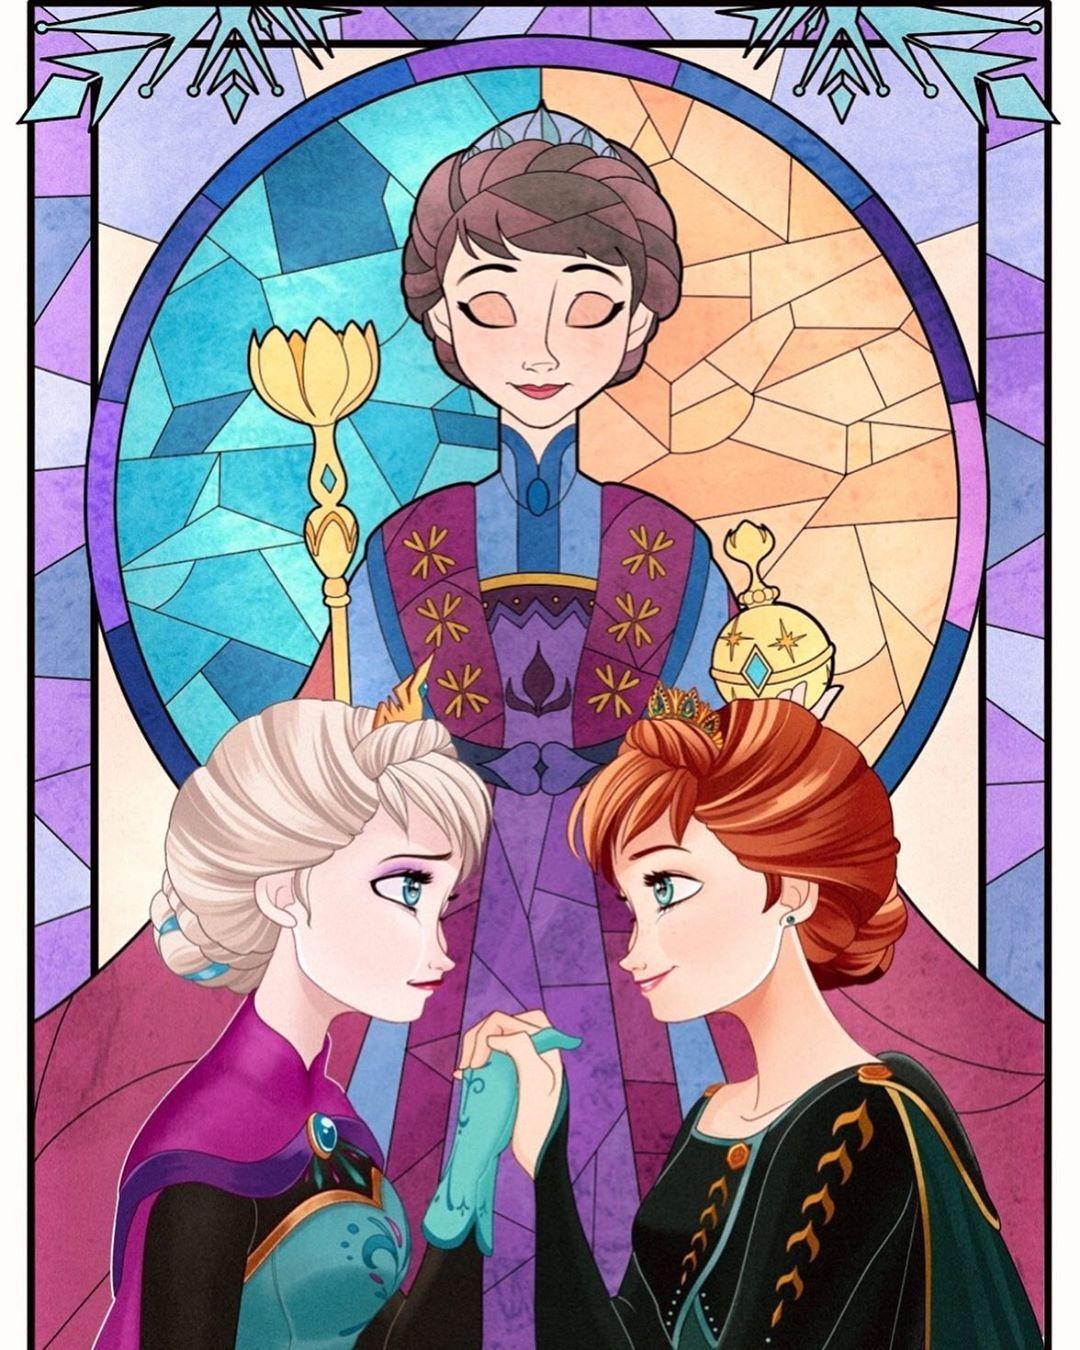 381 Curtidas 0 Comentarios Ã'¸ã'§ã'¹ íペス Õェルナンデス Celestialcio No Instagram Art By Taralotta I In 2020 Frozen Disney Movie Disney Princess Art Disney Princess Frozen